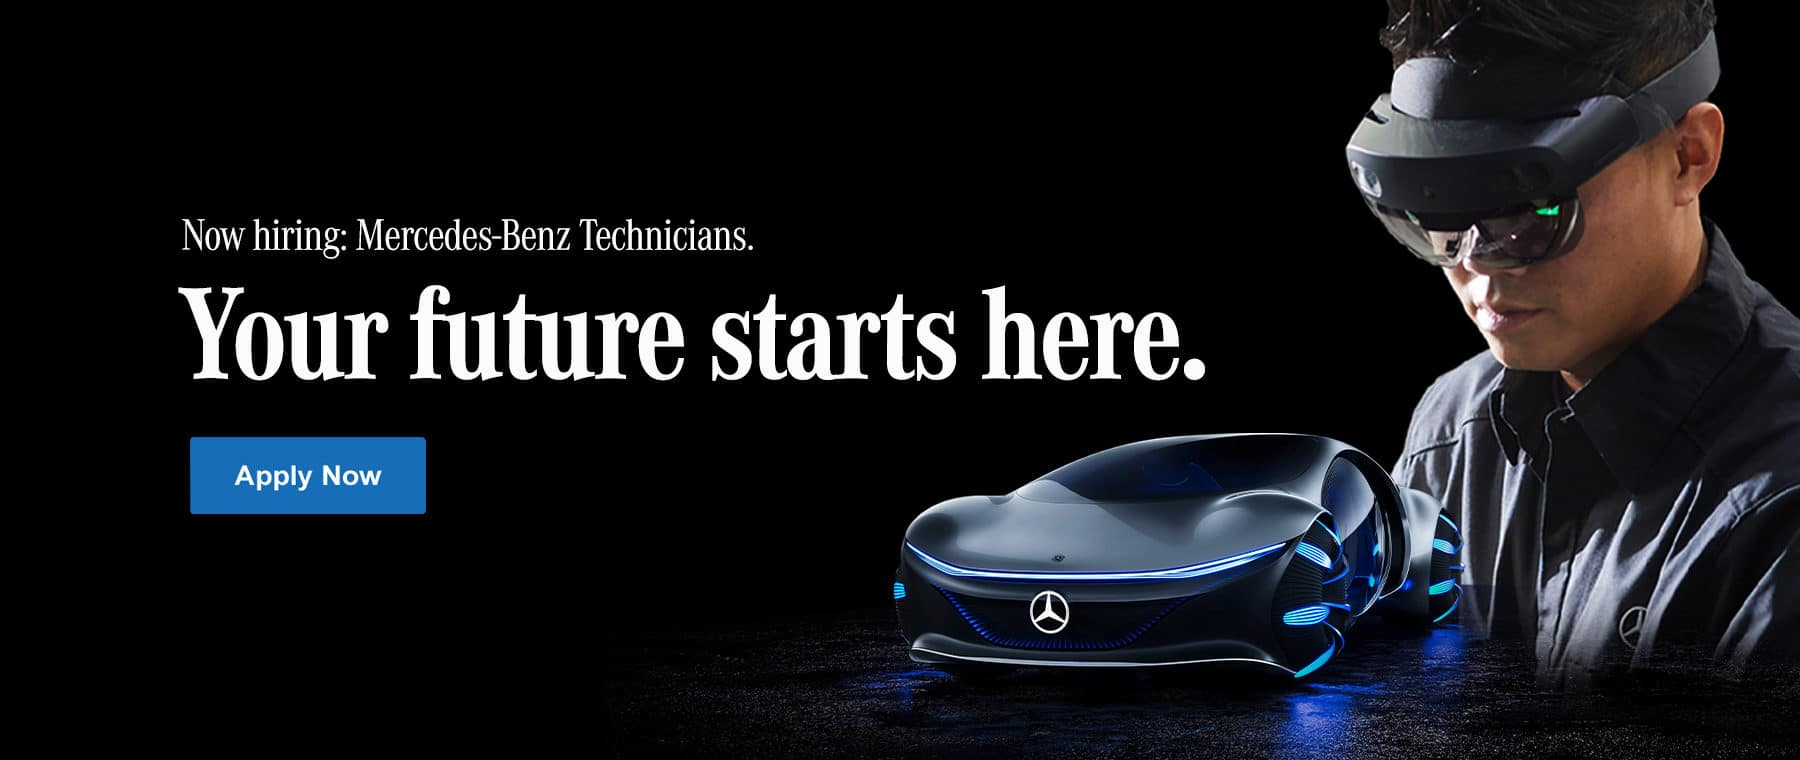 Mercedes-Benz of Beaverton Mercedes technicians jobs